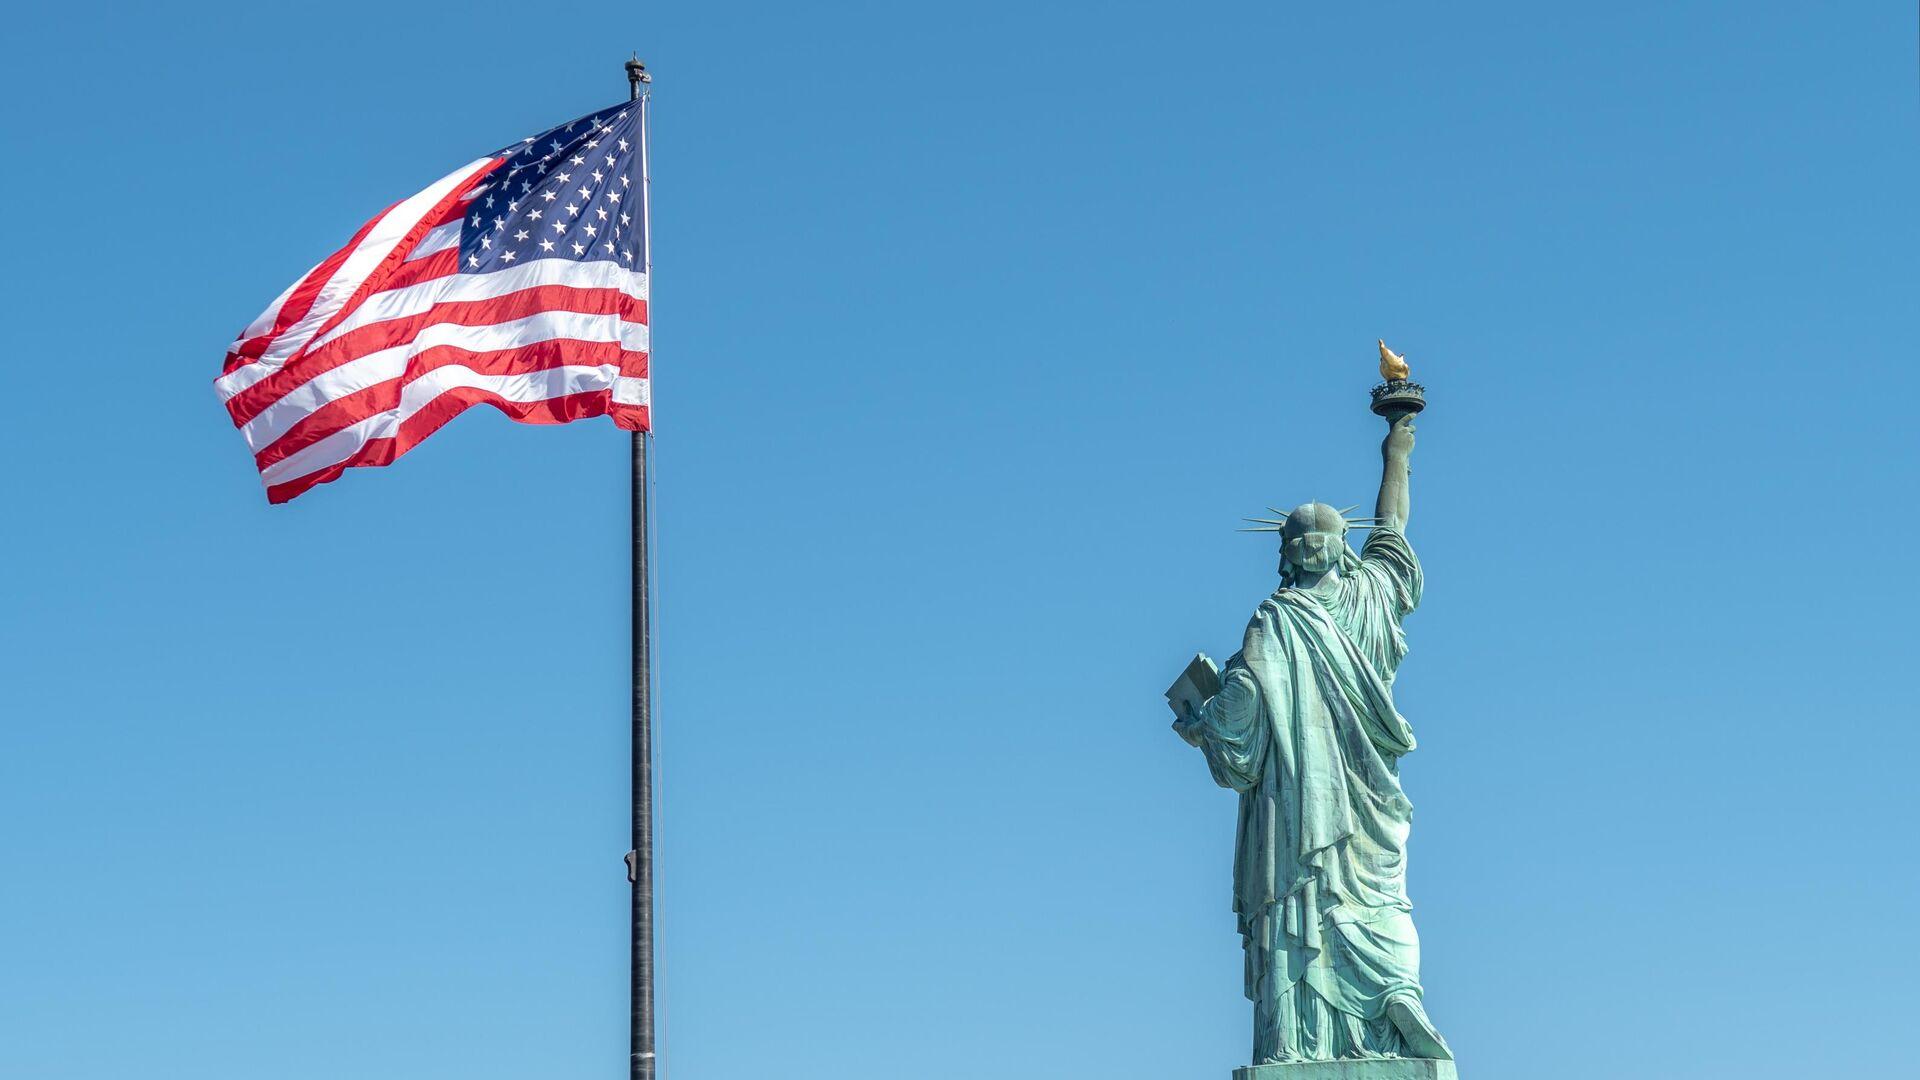 Празднование Дня независимости США - РИА Новости, 1920, 25.05.2021